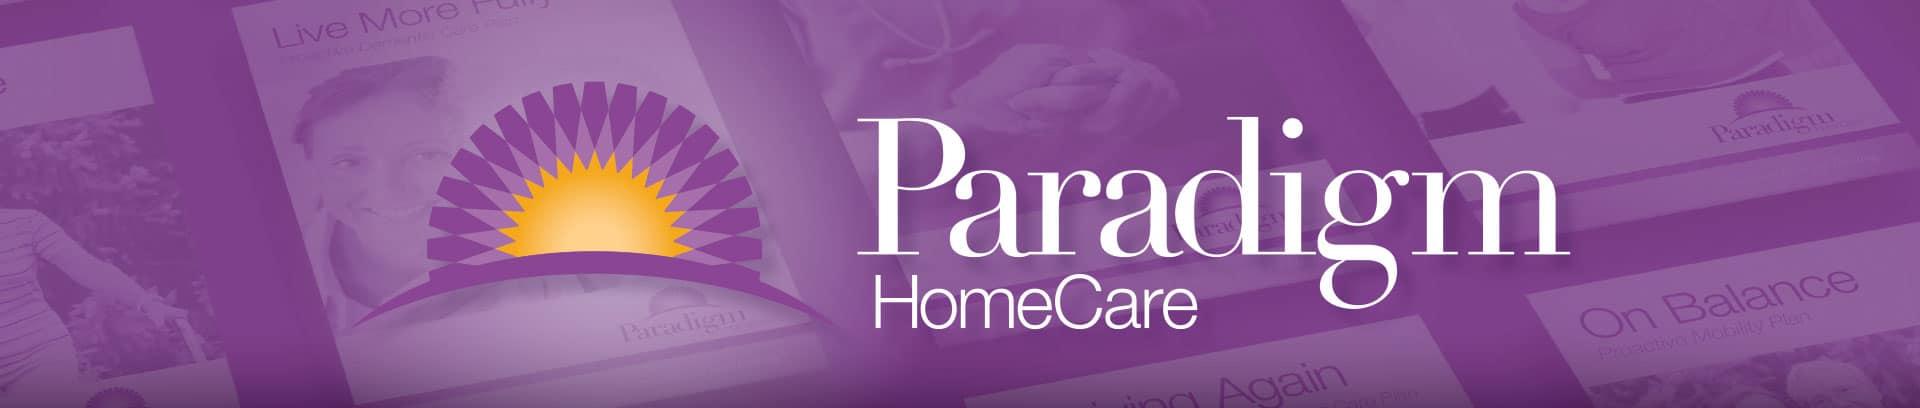 Paradigm Health Branded Campaign